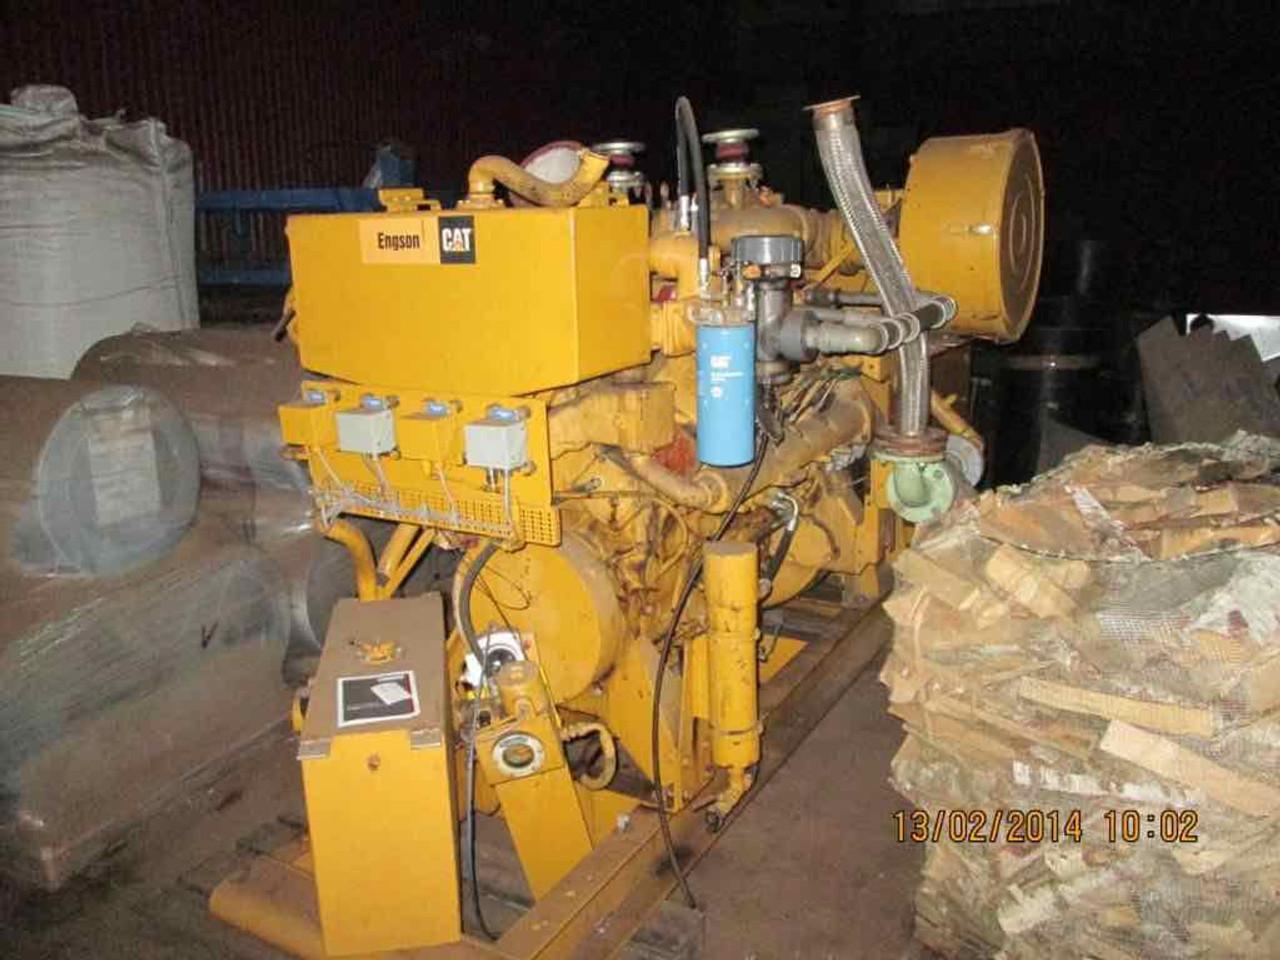 Cat 3306 Natural Gas Engine Specs